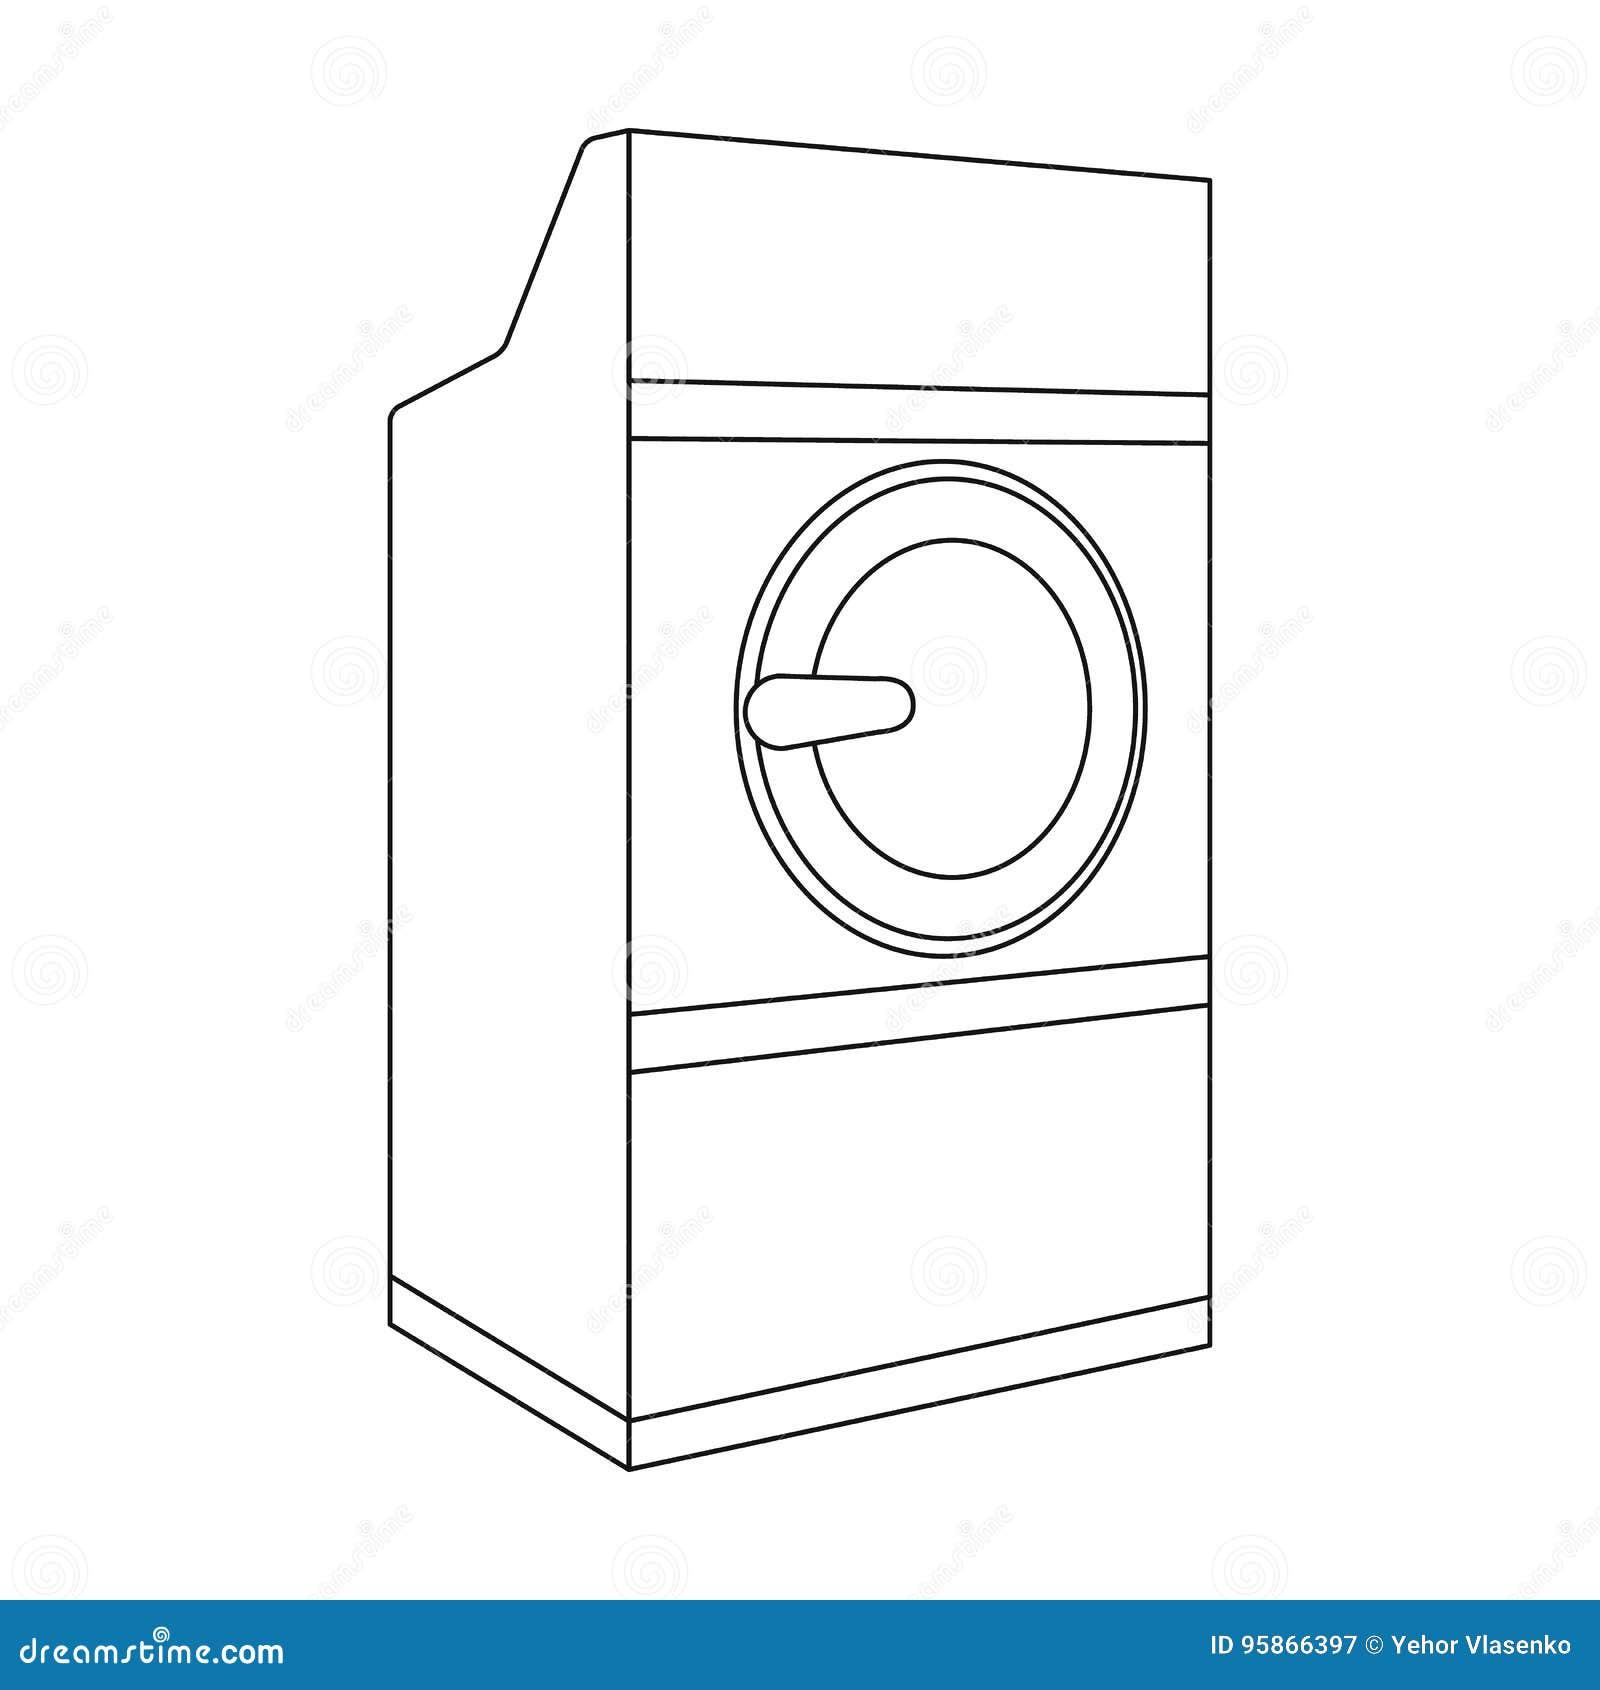 Industrial washing machine dry cleaning single icon in black dry cleaning single icon in black style vector symbol stock illustration web buycottarizona Choice Image